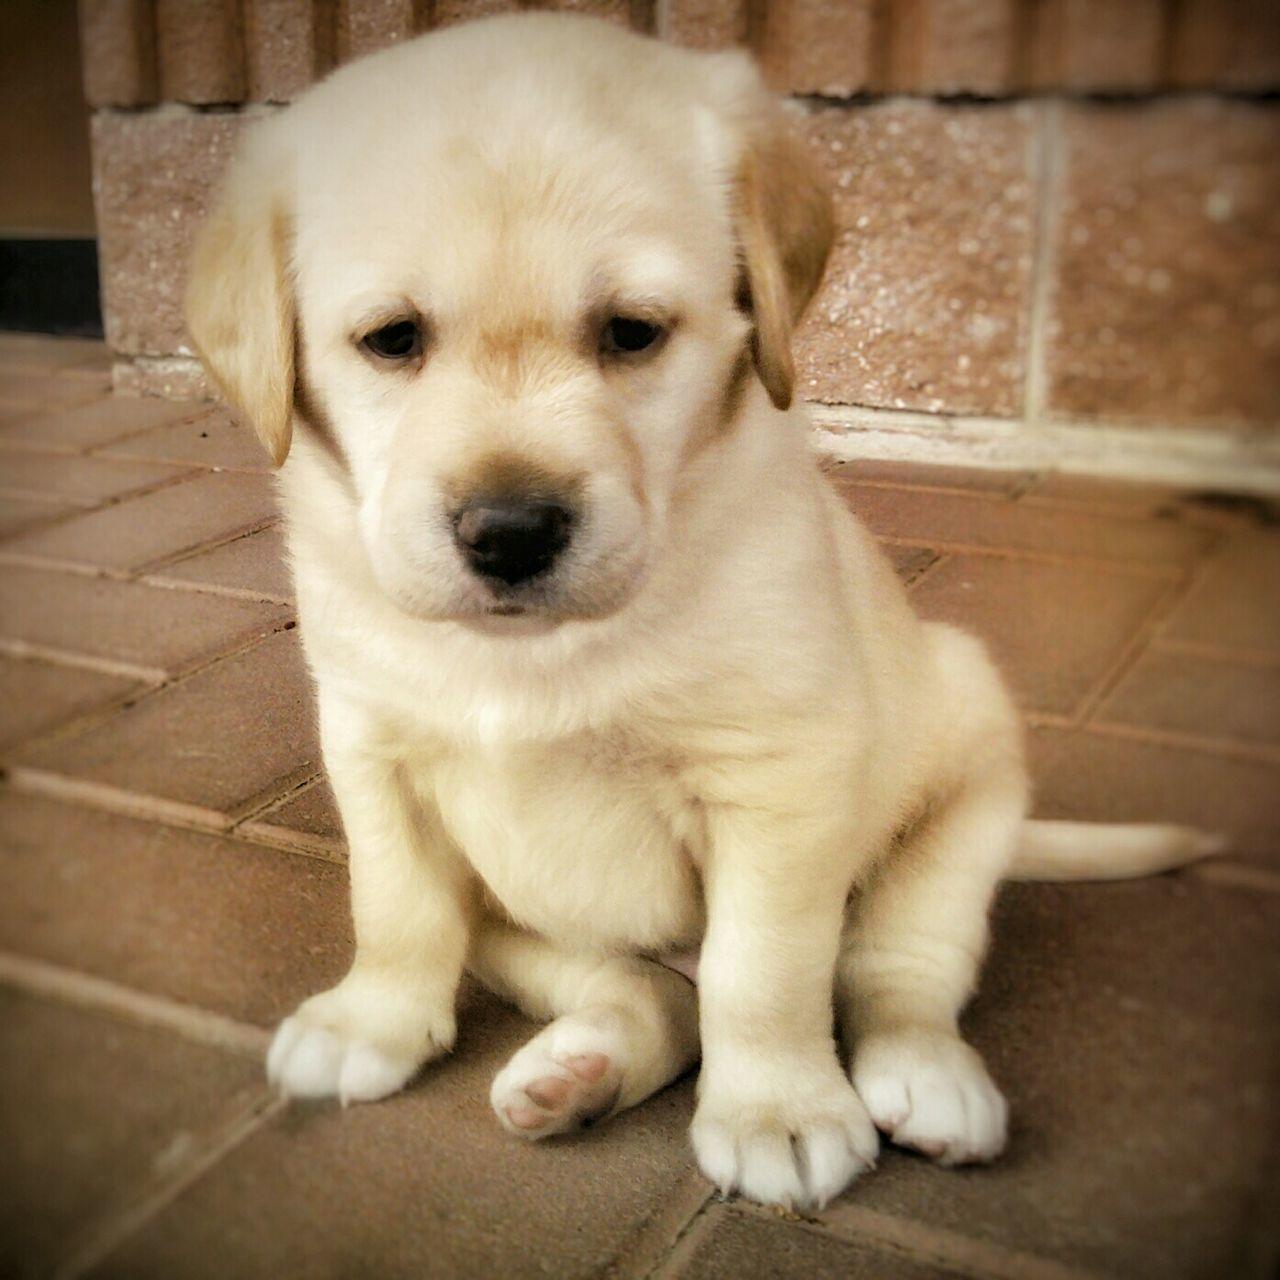 Puppy Love Puppy❤ Littedog Littlefriend♥ Lookatme Dreamer Pets